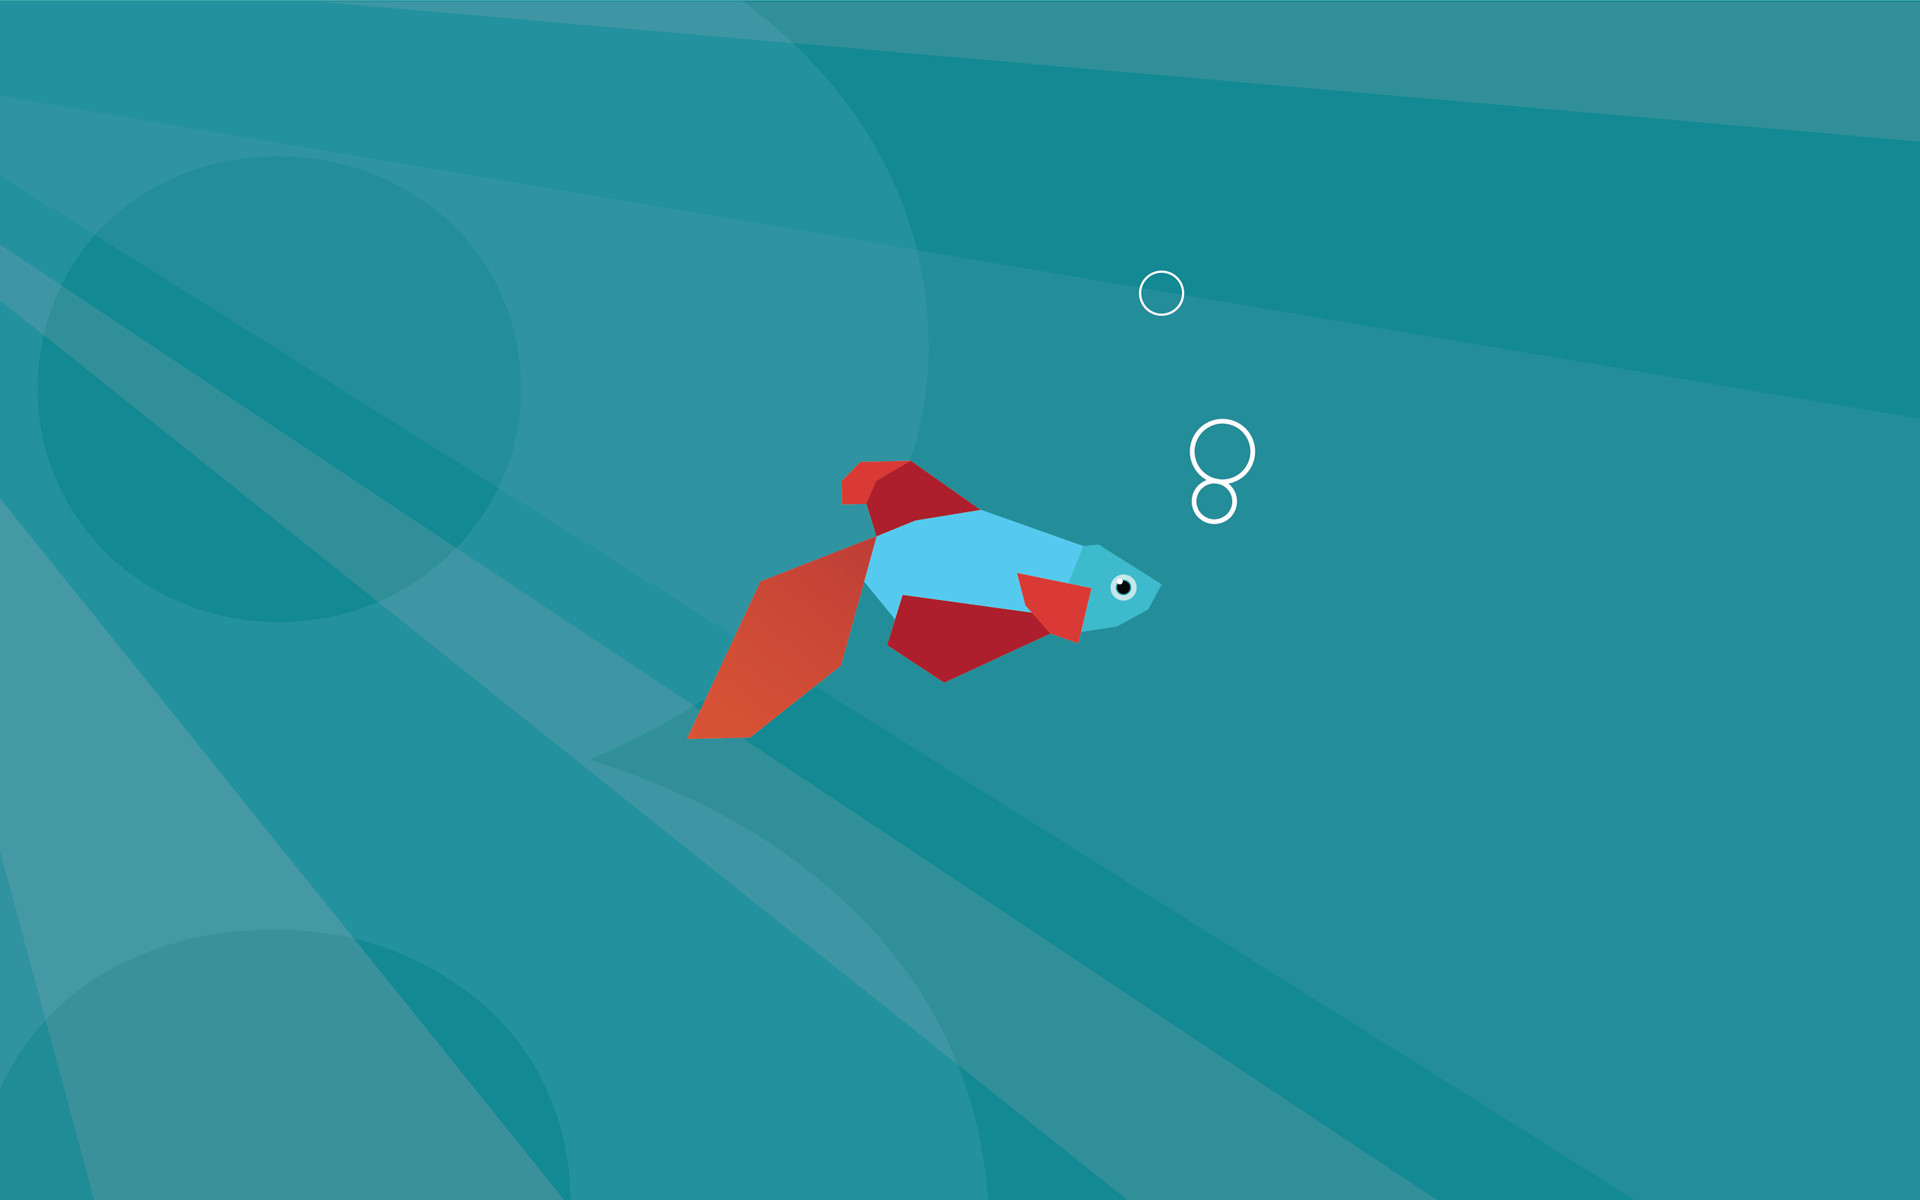 Windows 10 Fish Images (Mobile, iPad)